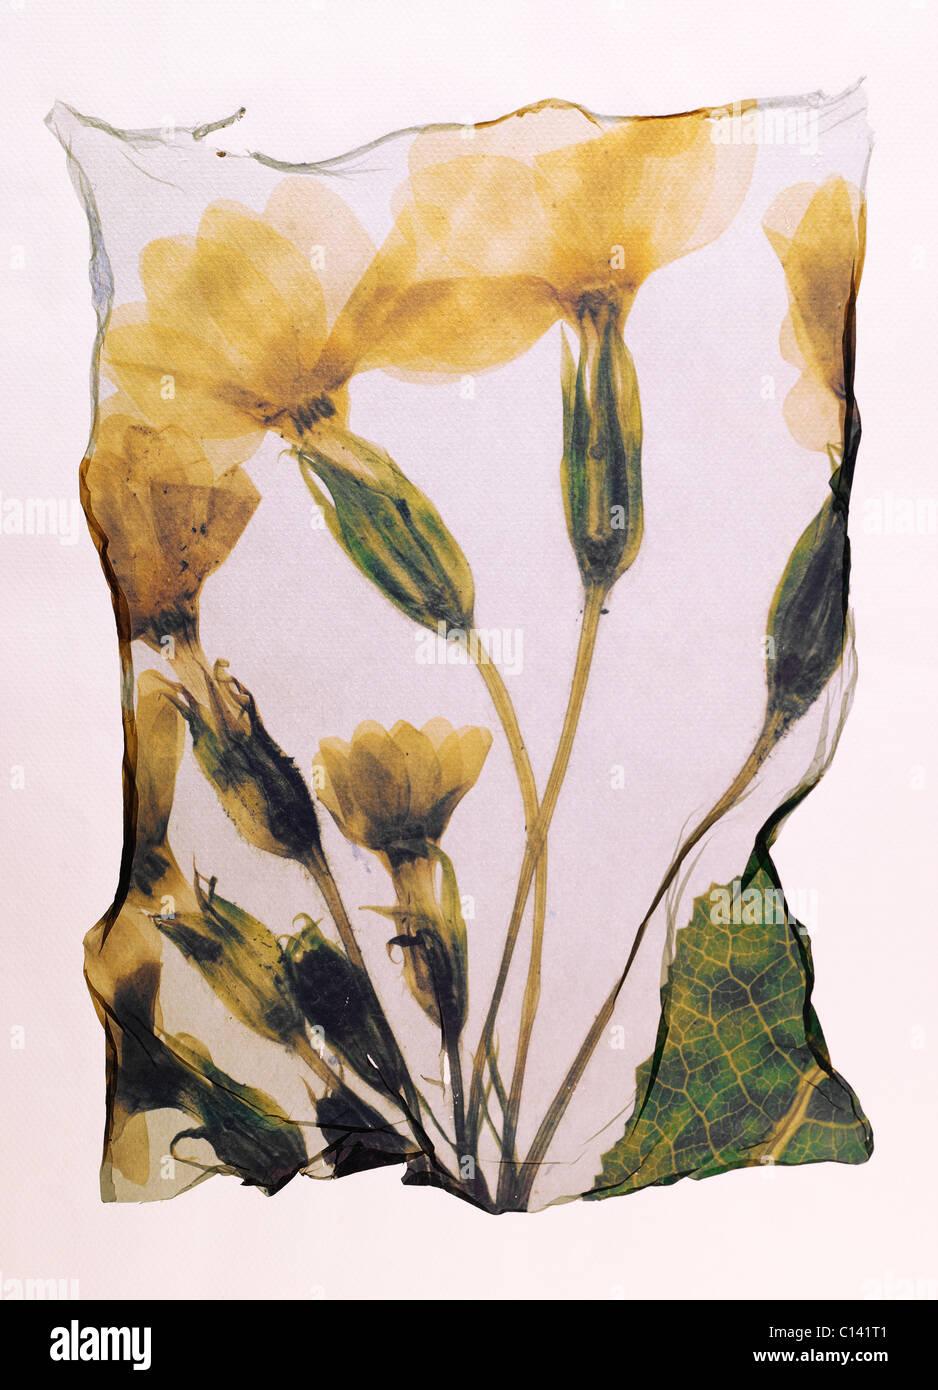 Pressed Primrose ( Primula Vulgaris )- Wild flowers - Polaroid lift. - Stock Image